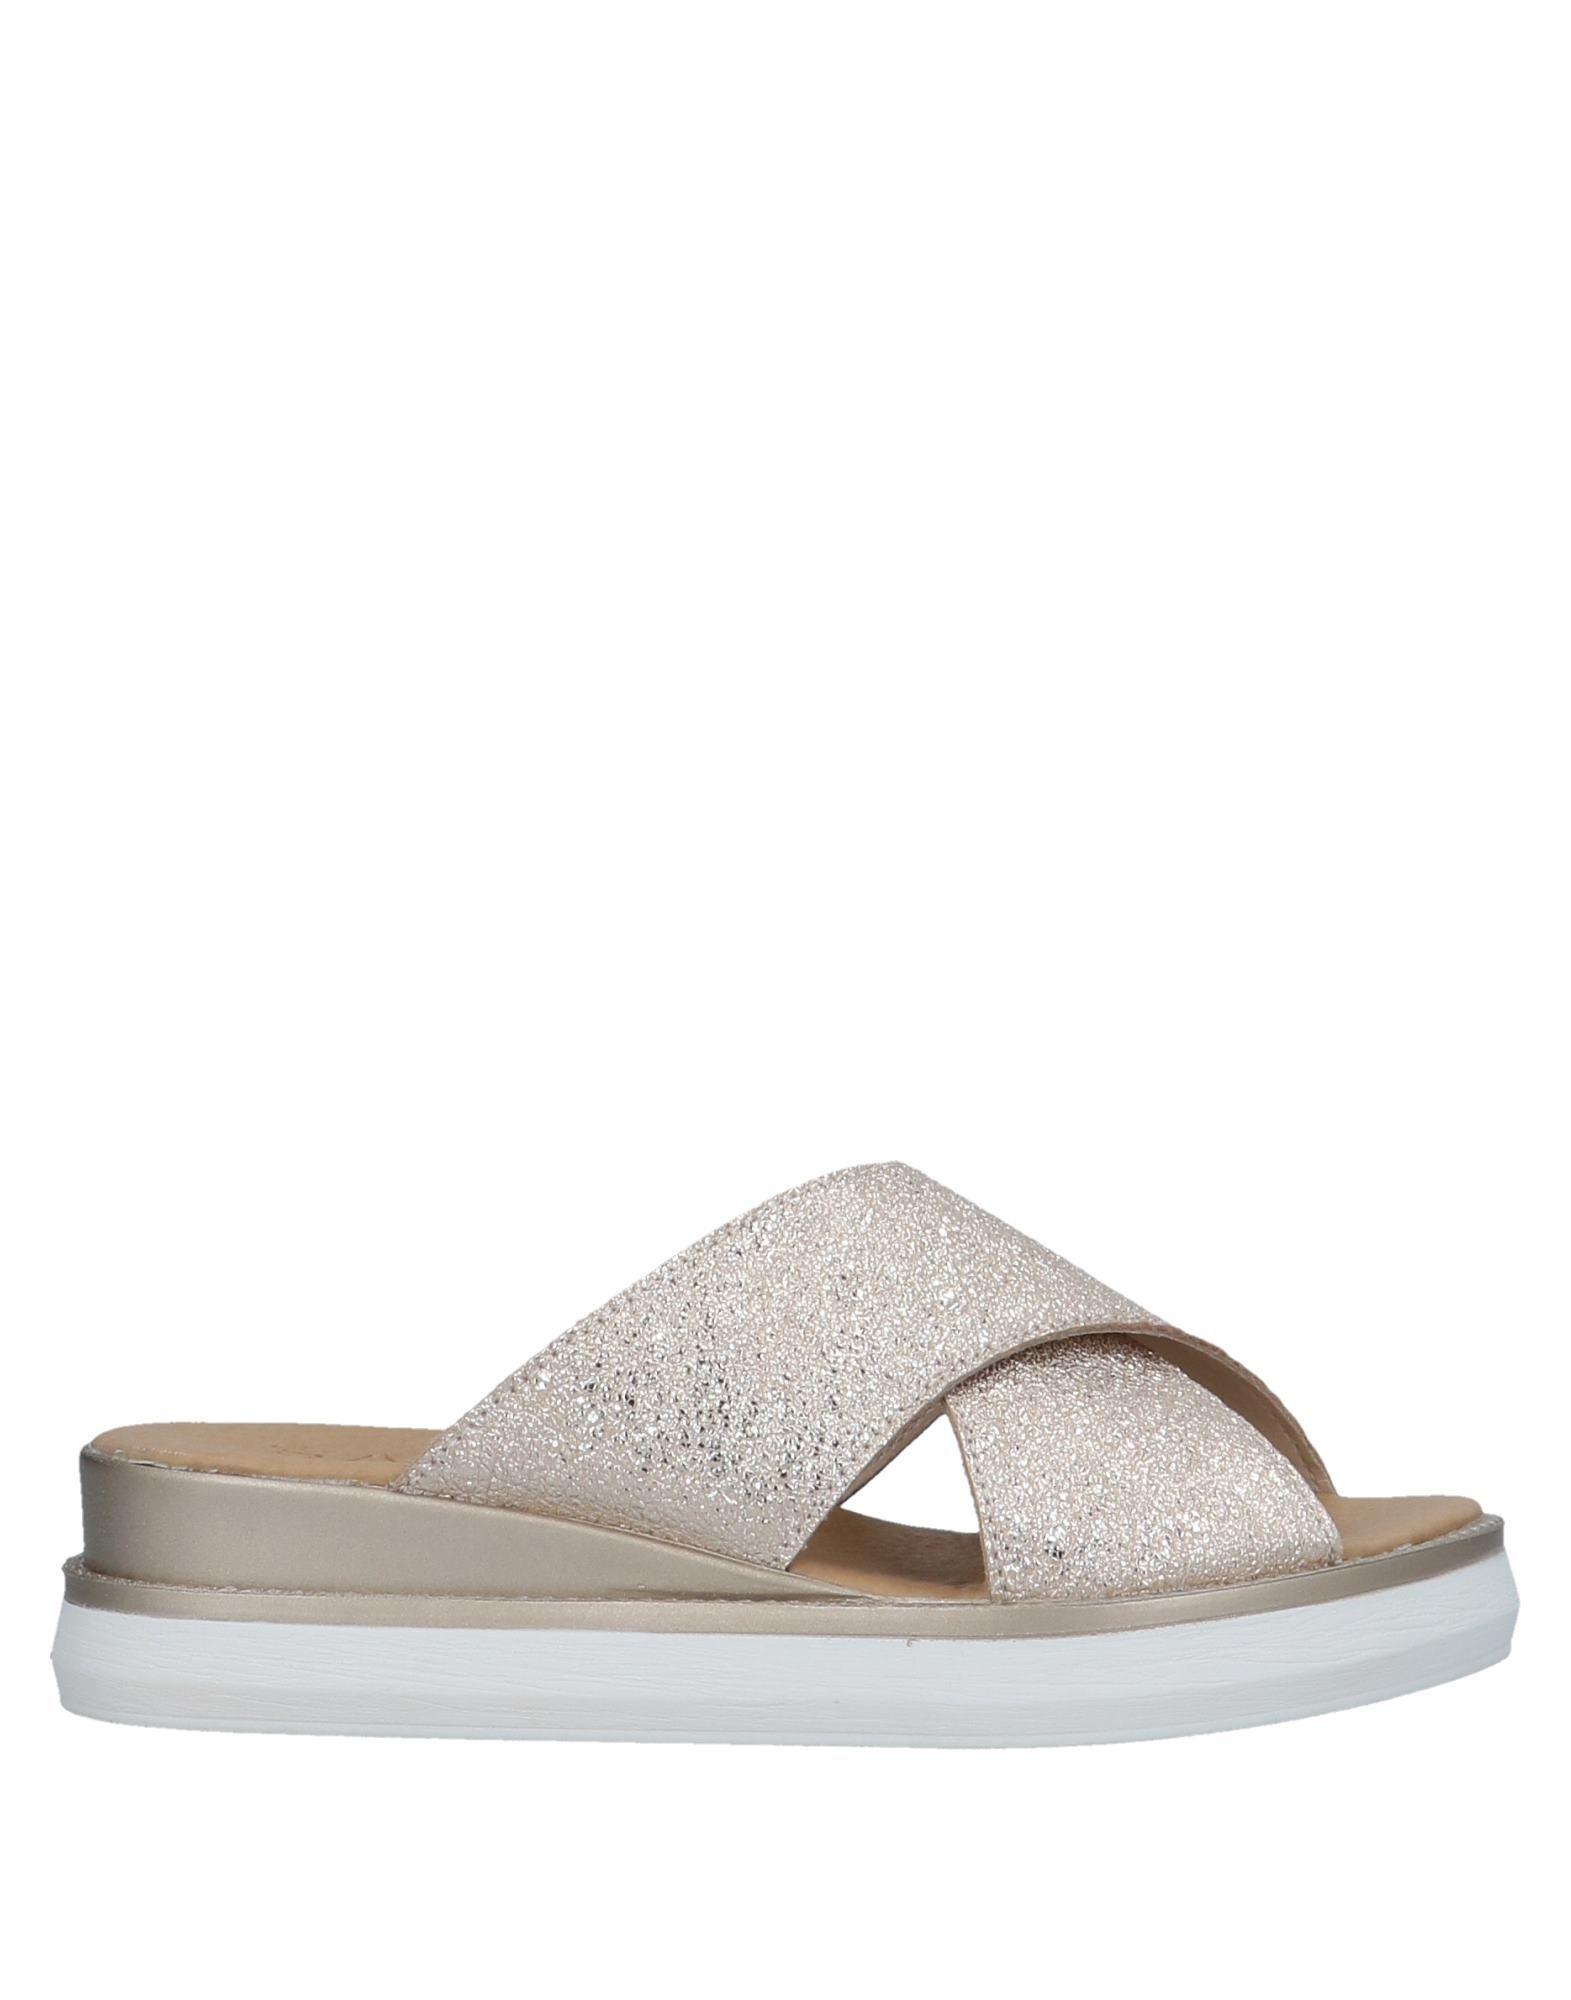 Sara Sandalen Damen  11536409HA Gute Qualität beliebte Schuhe